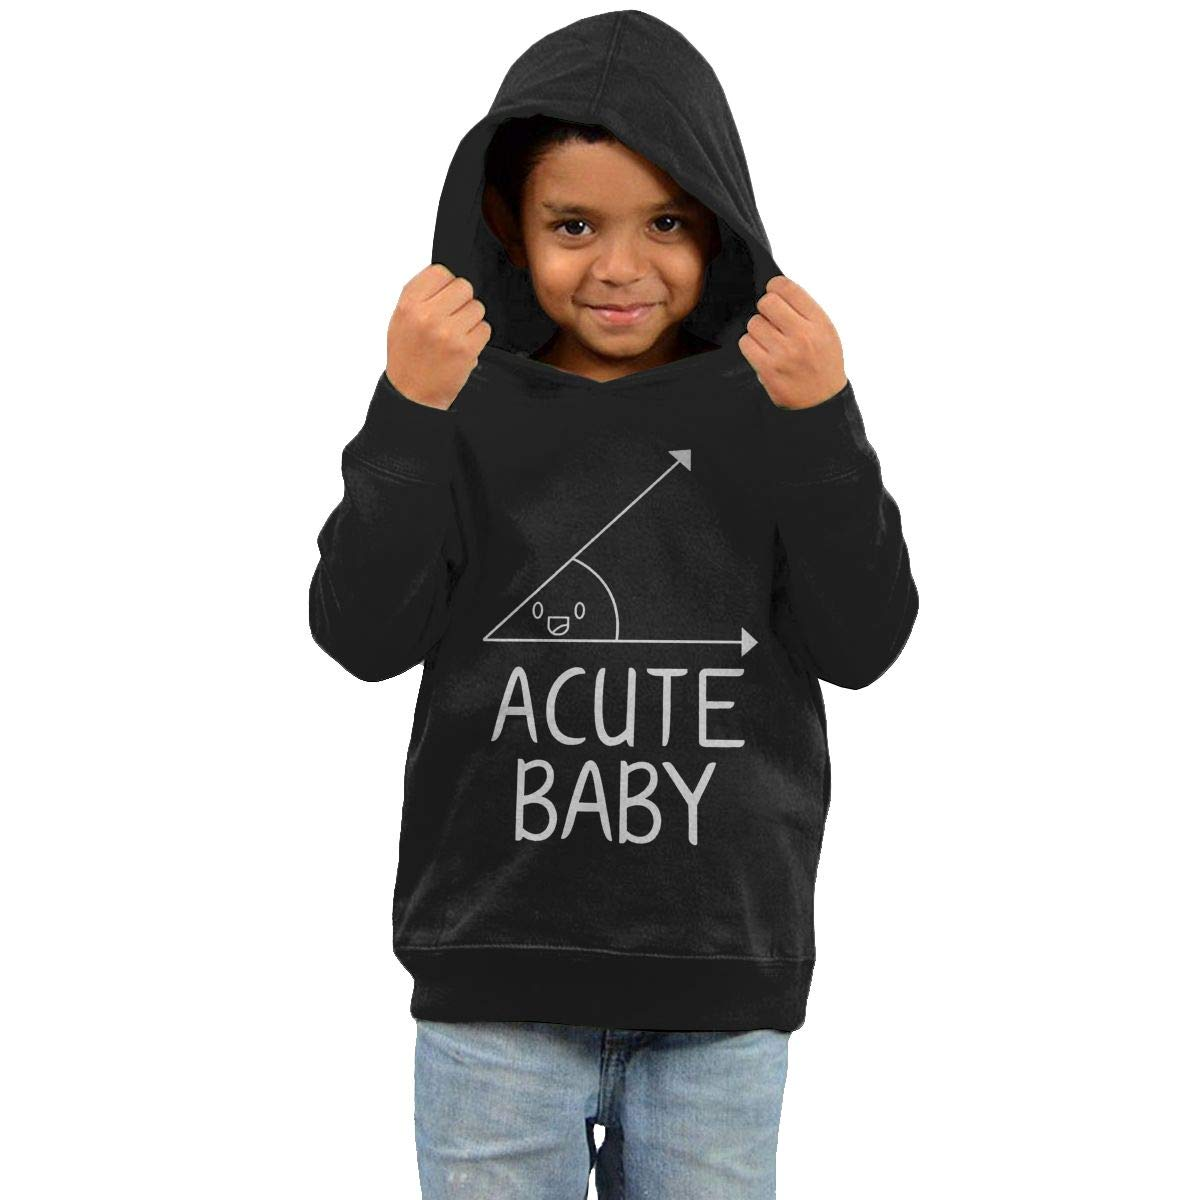 GUOZX Childrens Hooded Sweater Acute Baby Girl Sweater Black